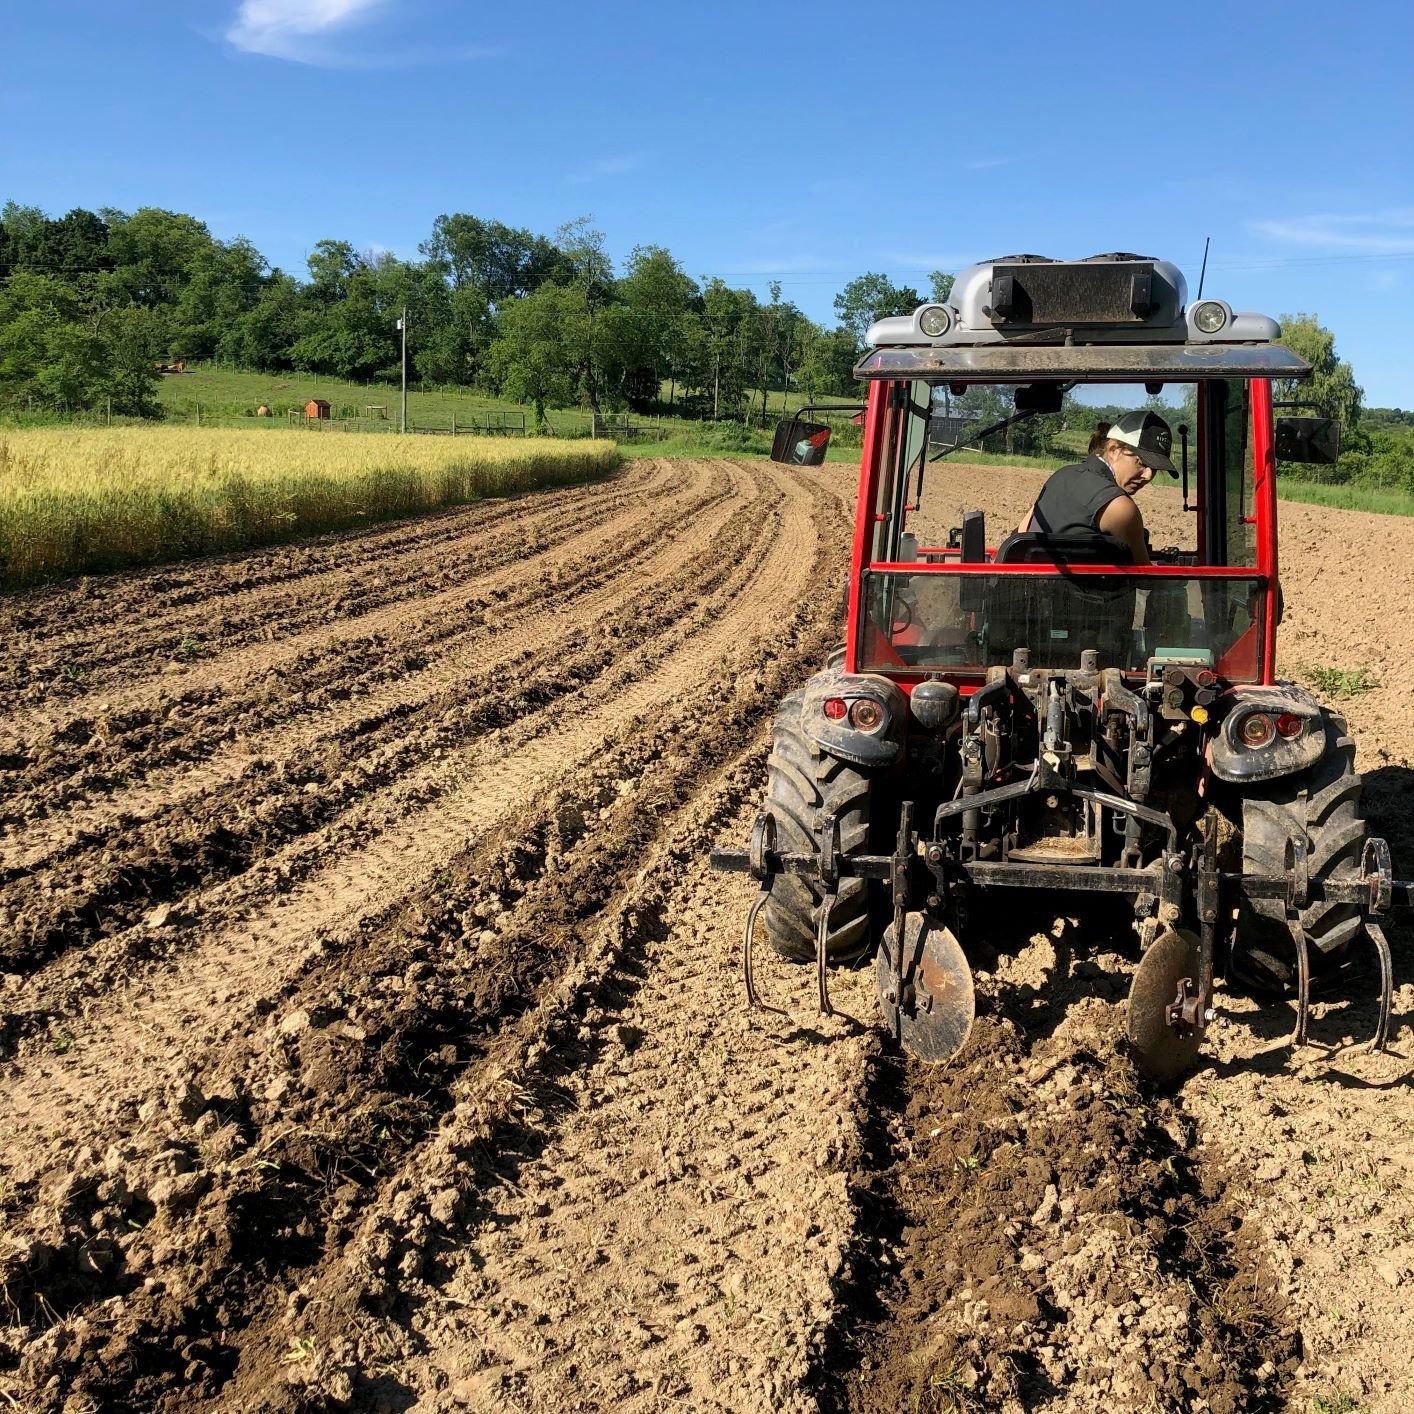 Next Happening: Farm Happenings for June 18, 2019 (week 2)